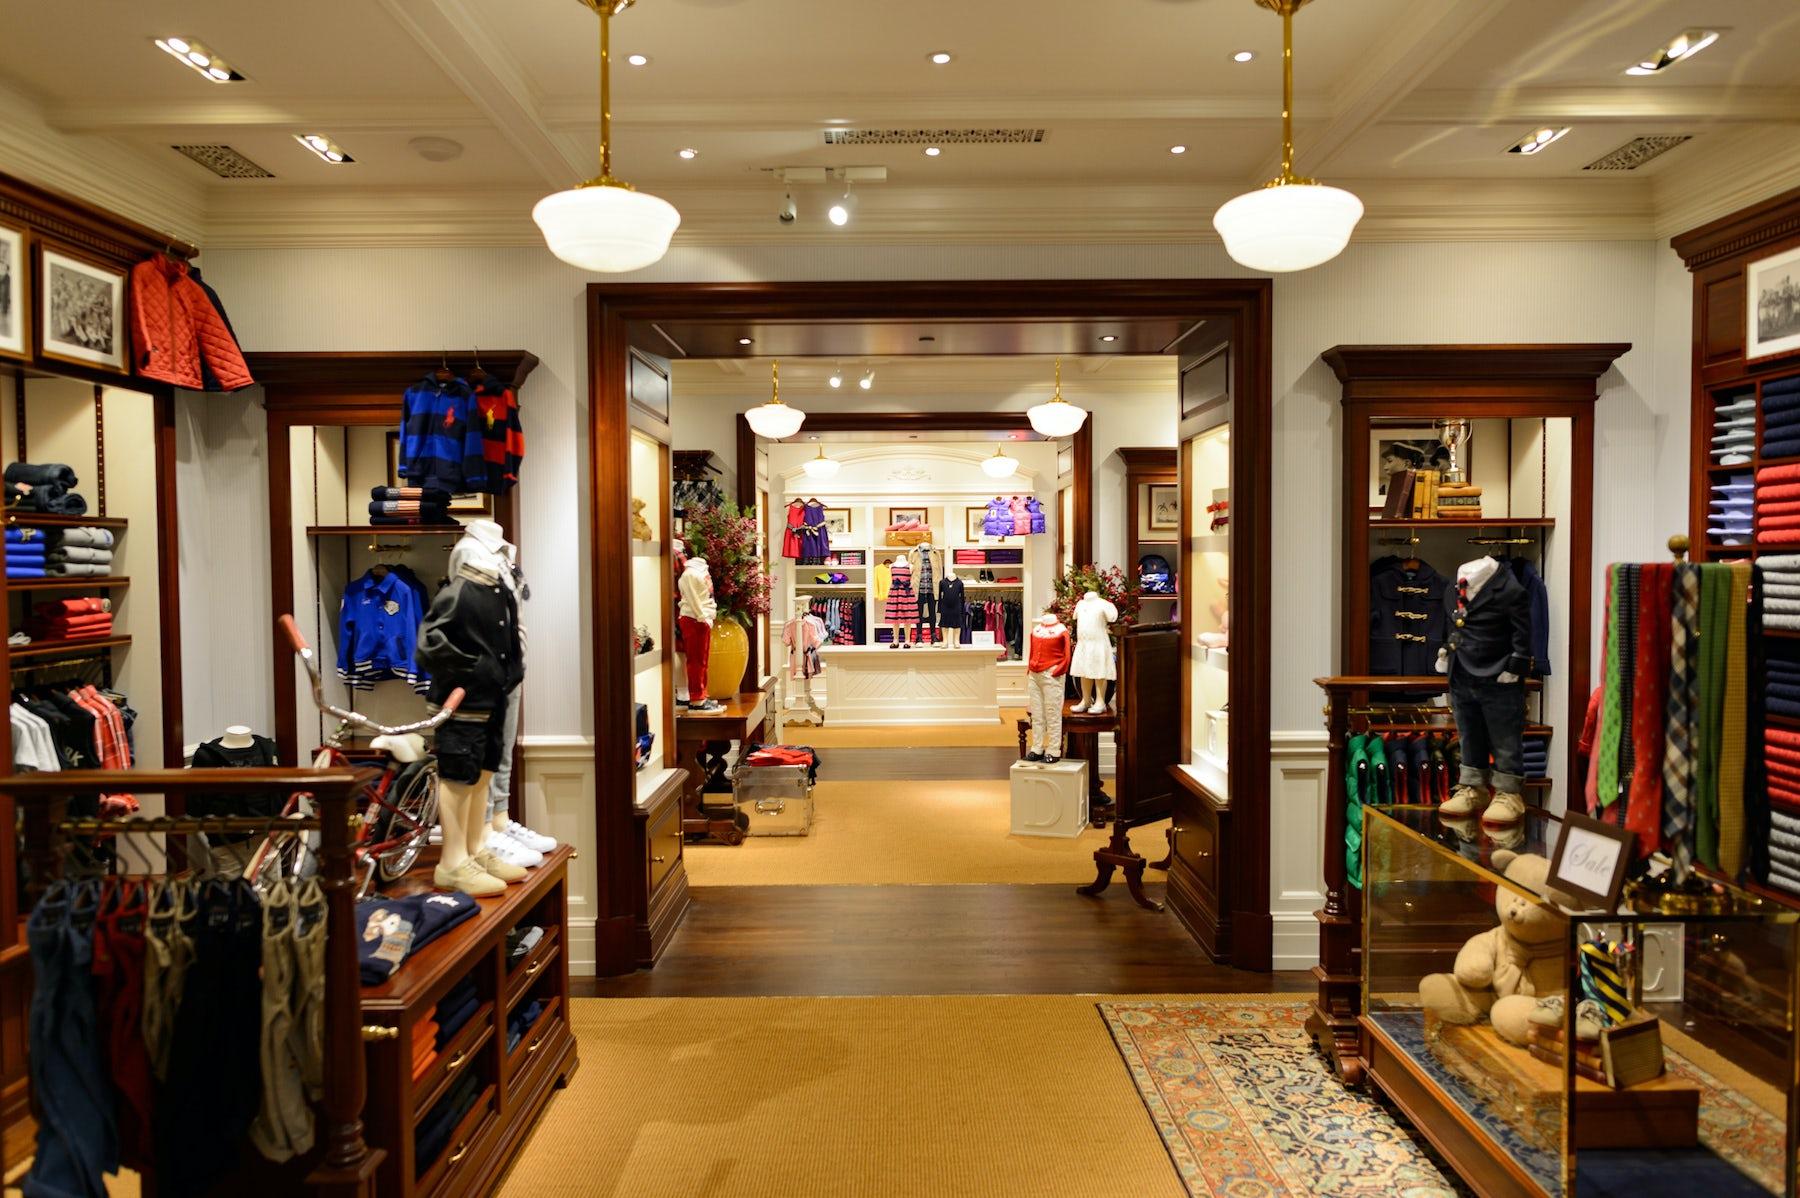 Ralph Lauren's Retreat From Discounting Helps Bolster Profit